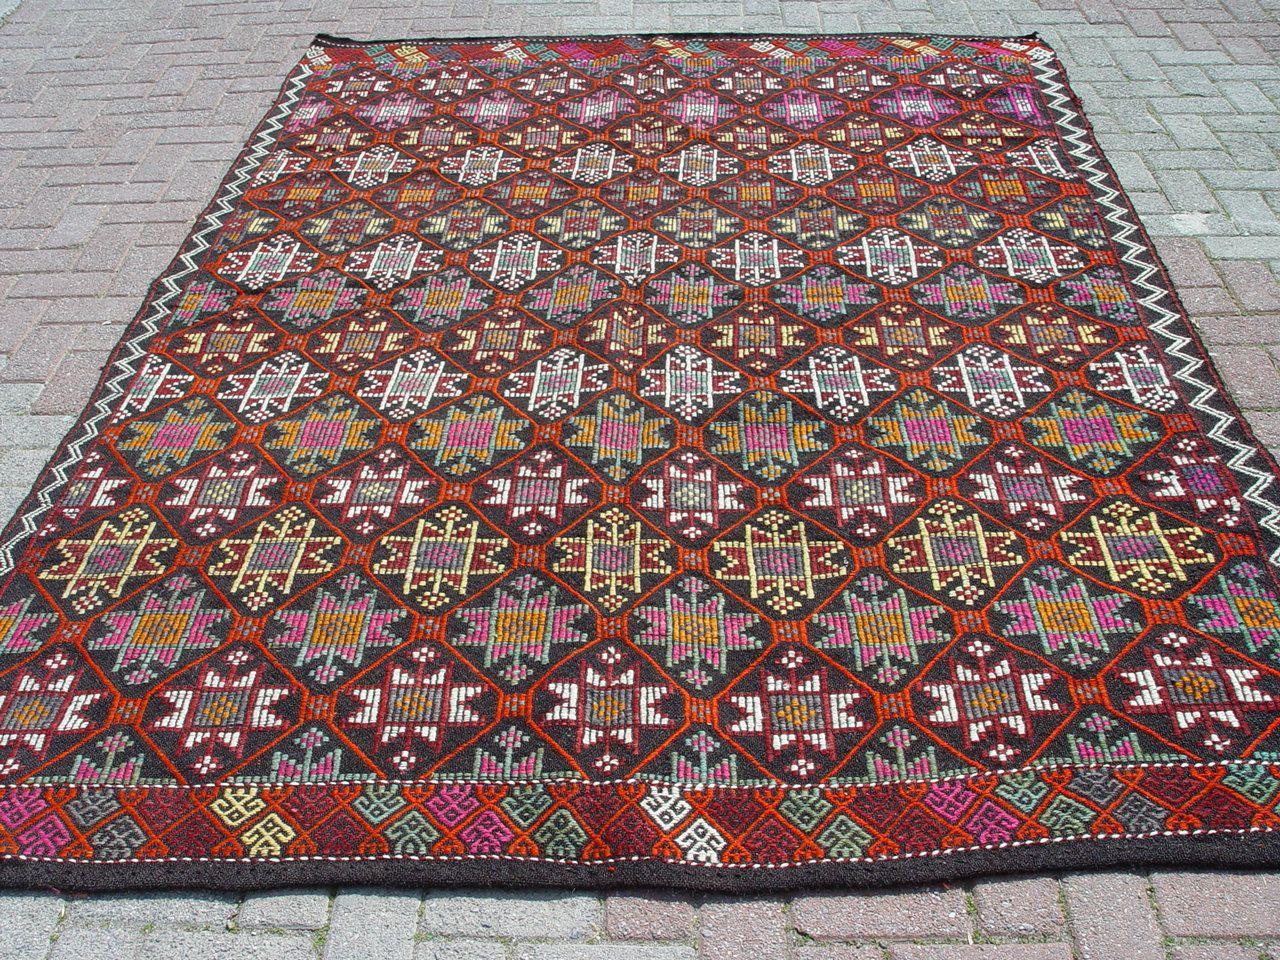 Vintage Turkish Kilim Rug Carpet Cicim Embroidered Handwoven Naturel Goat Hair On Wool